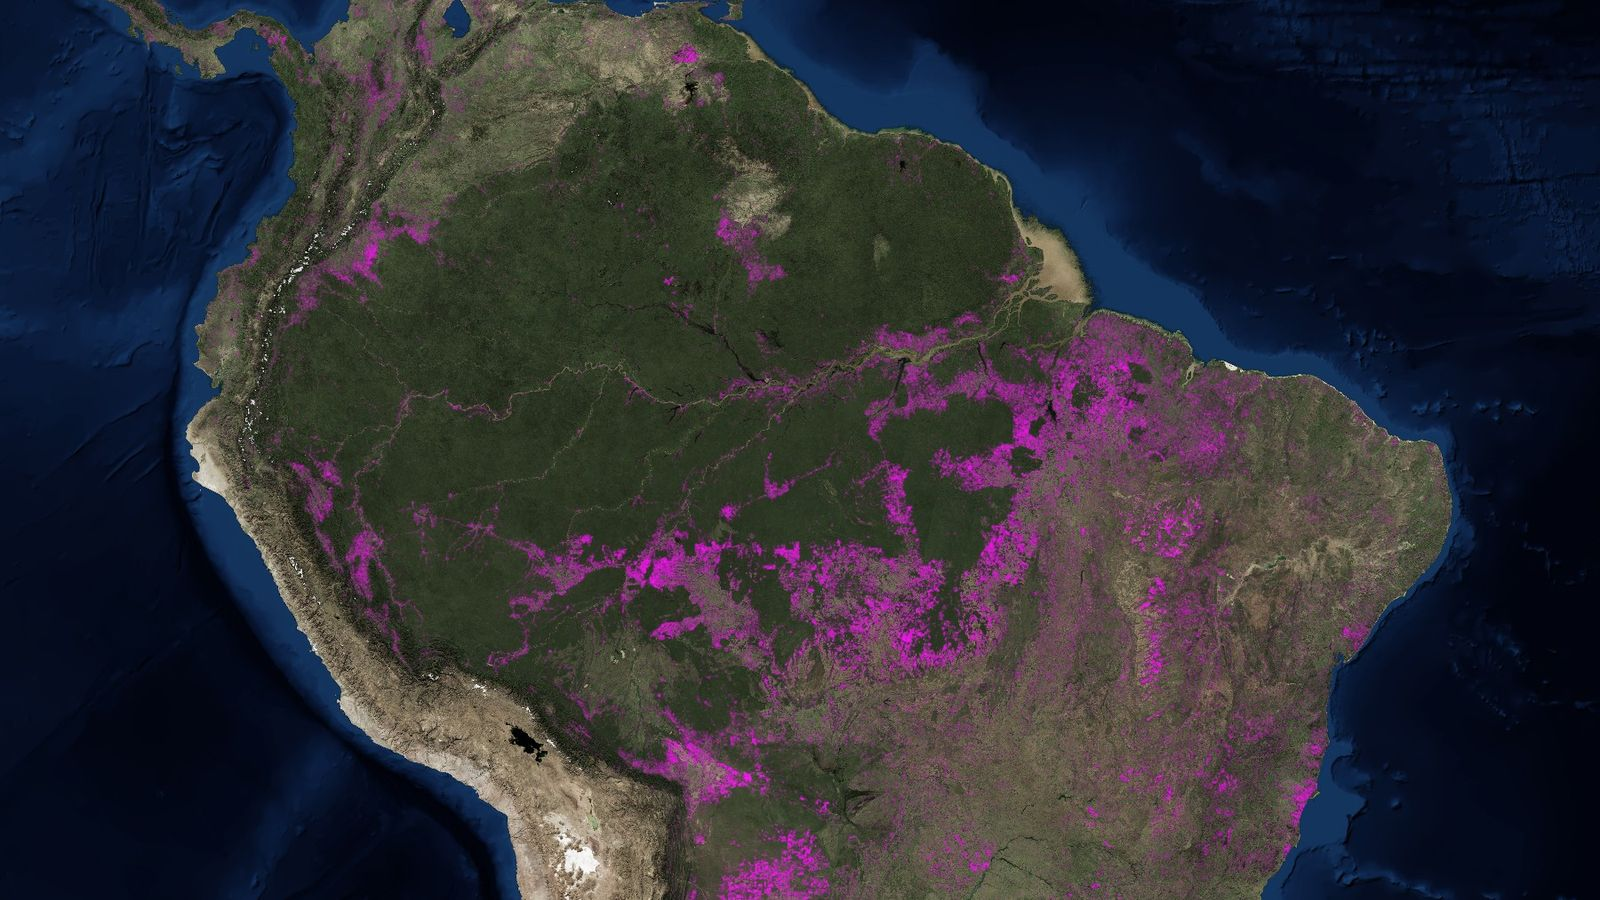 Sources : HANSEN / UMD / GOOGLE / USGS / NASA, Accessible via Global Forest Watch.